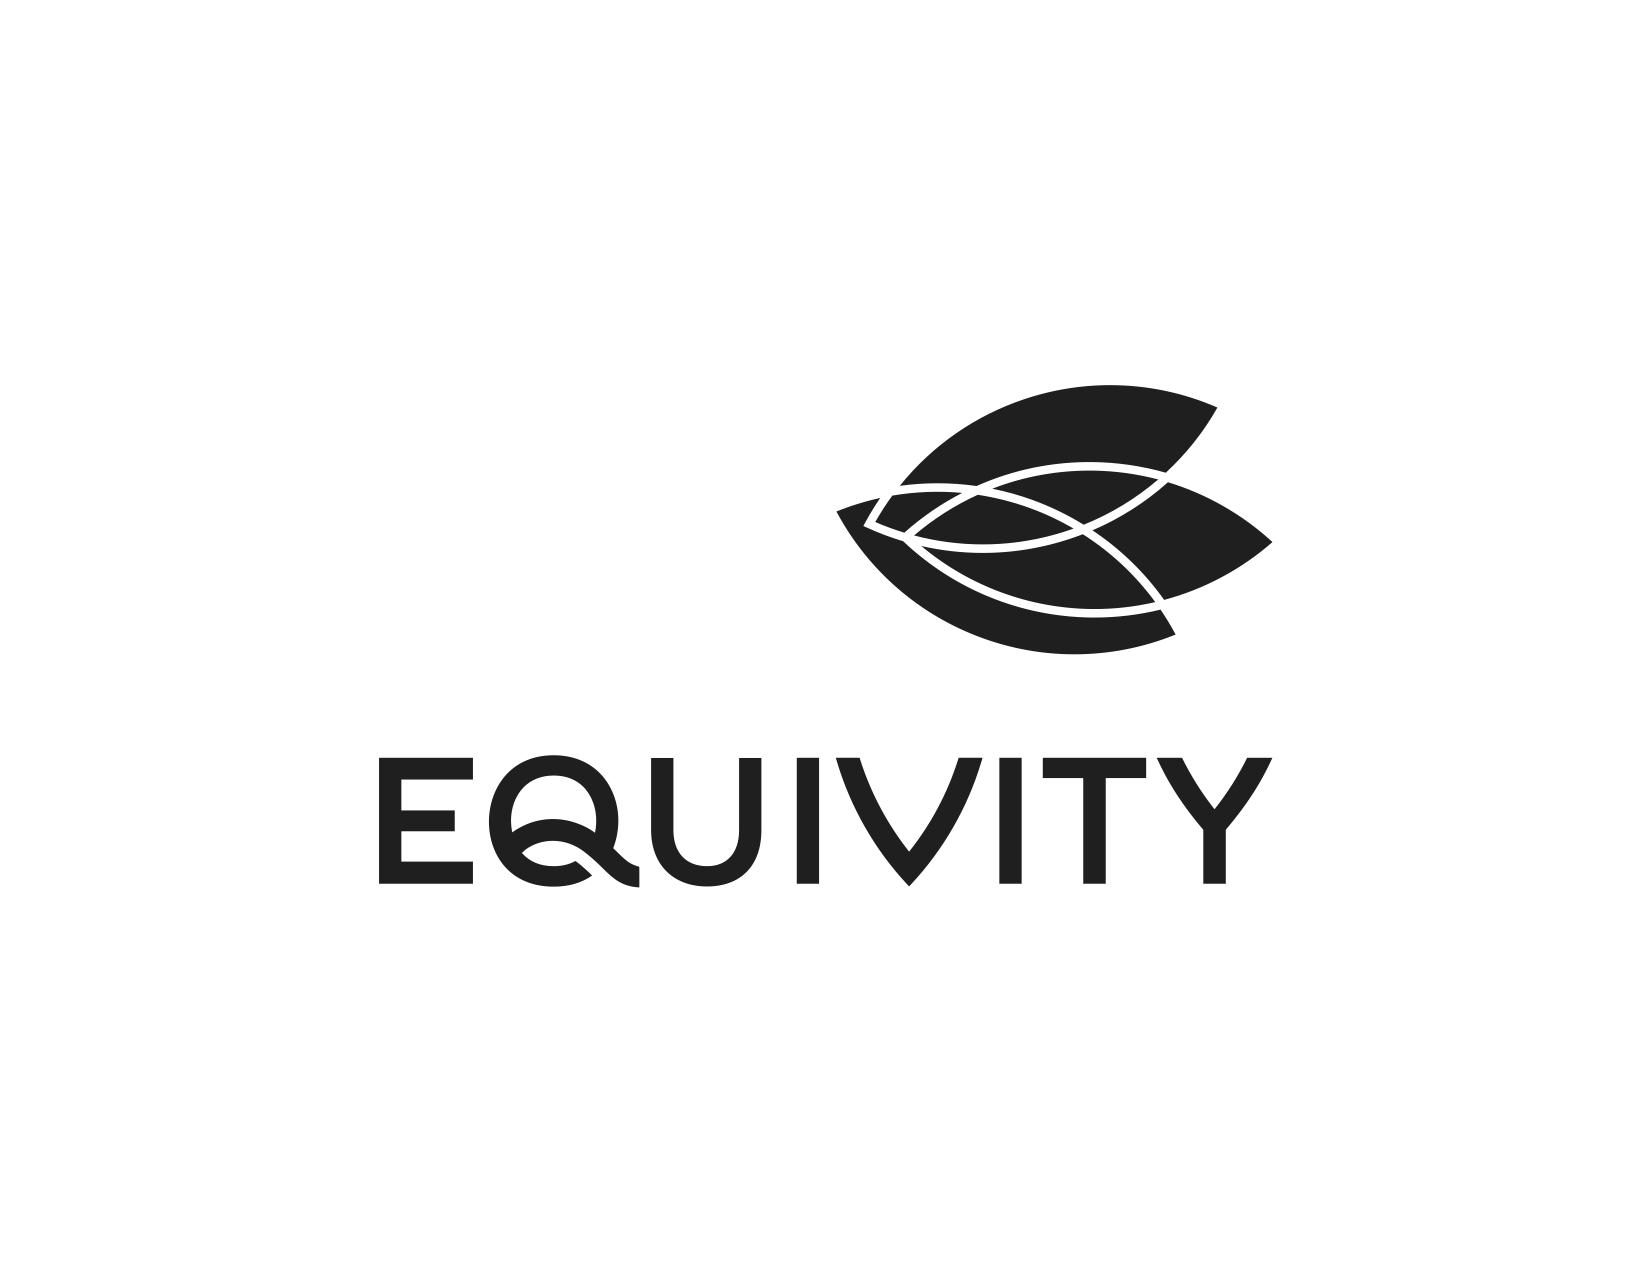 equivity